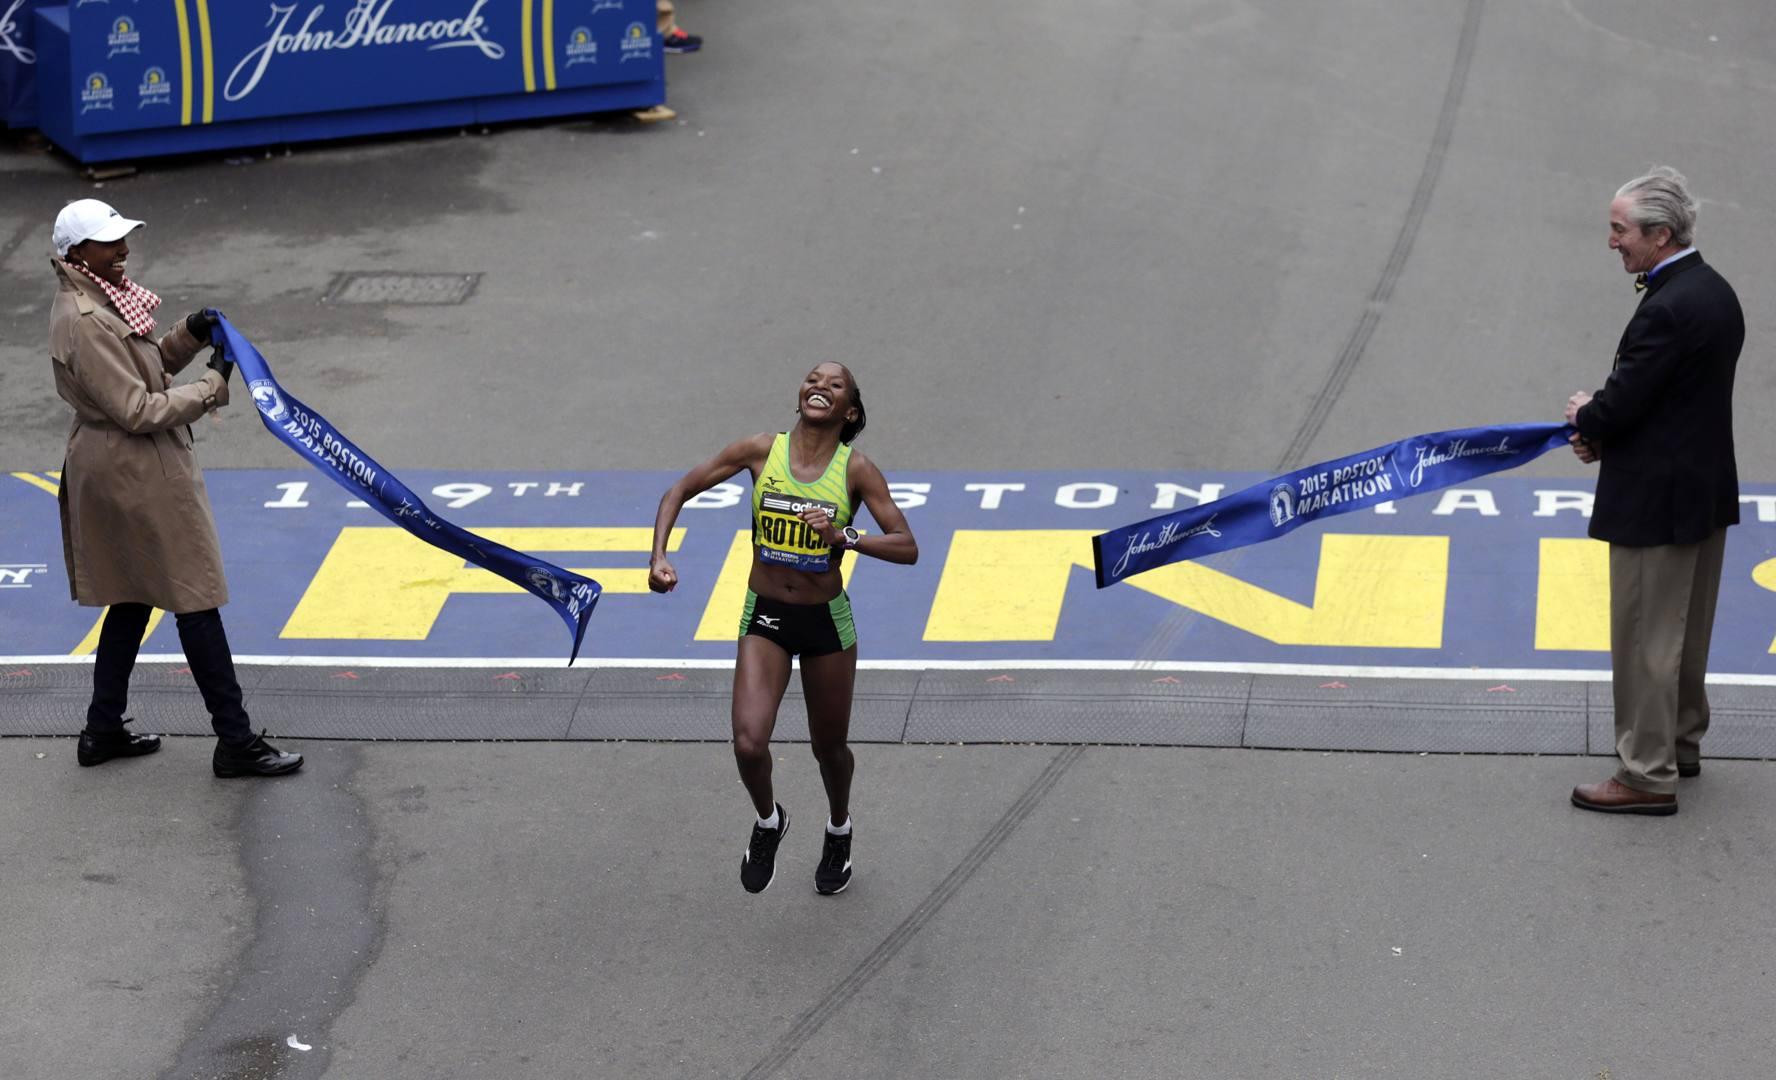 peel wins womens event - HD1776×1080